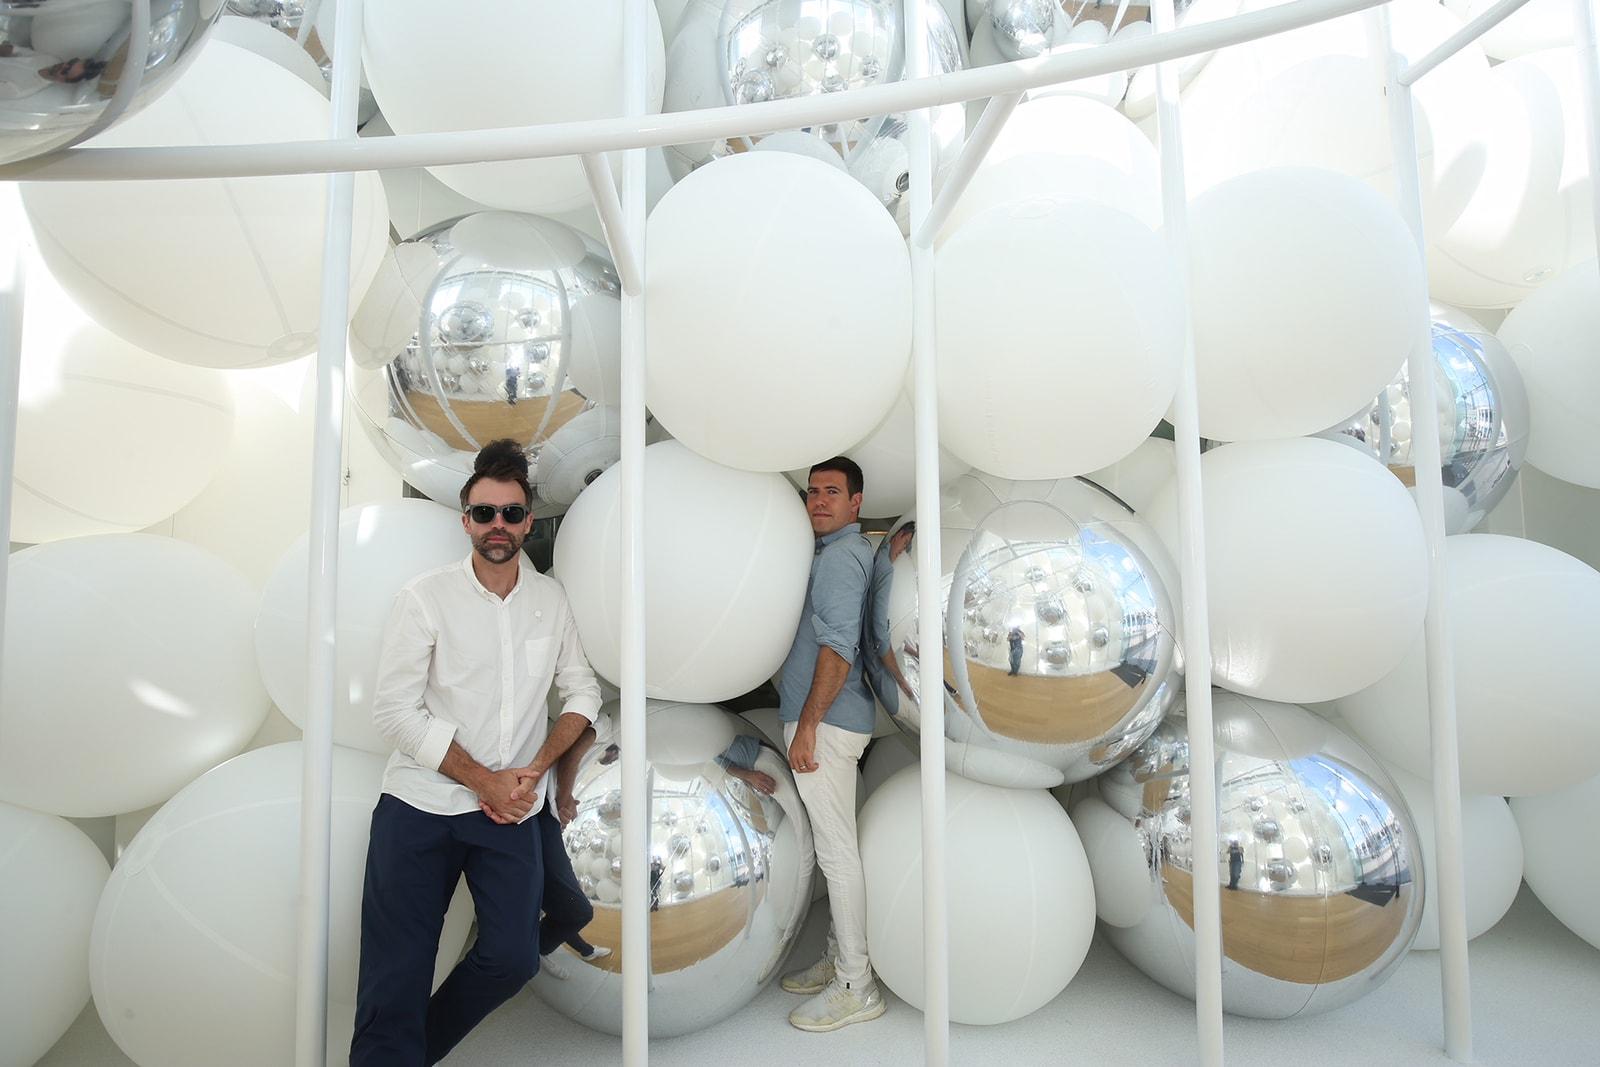 SNARKITECTURE 最新互動裝置藝術作品「BOUNCE」首度現身香港